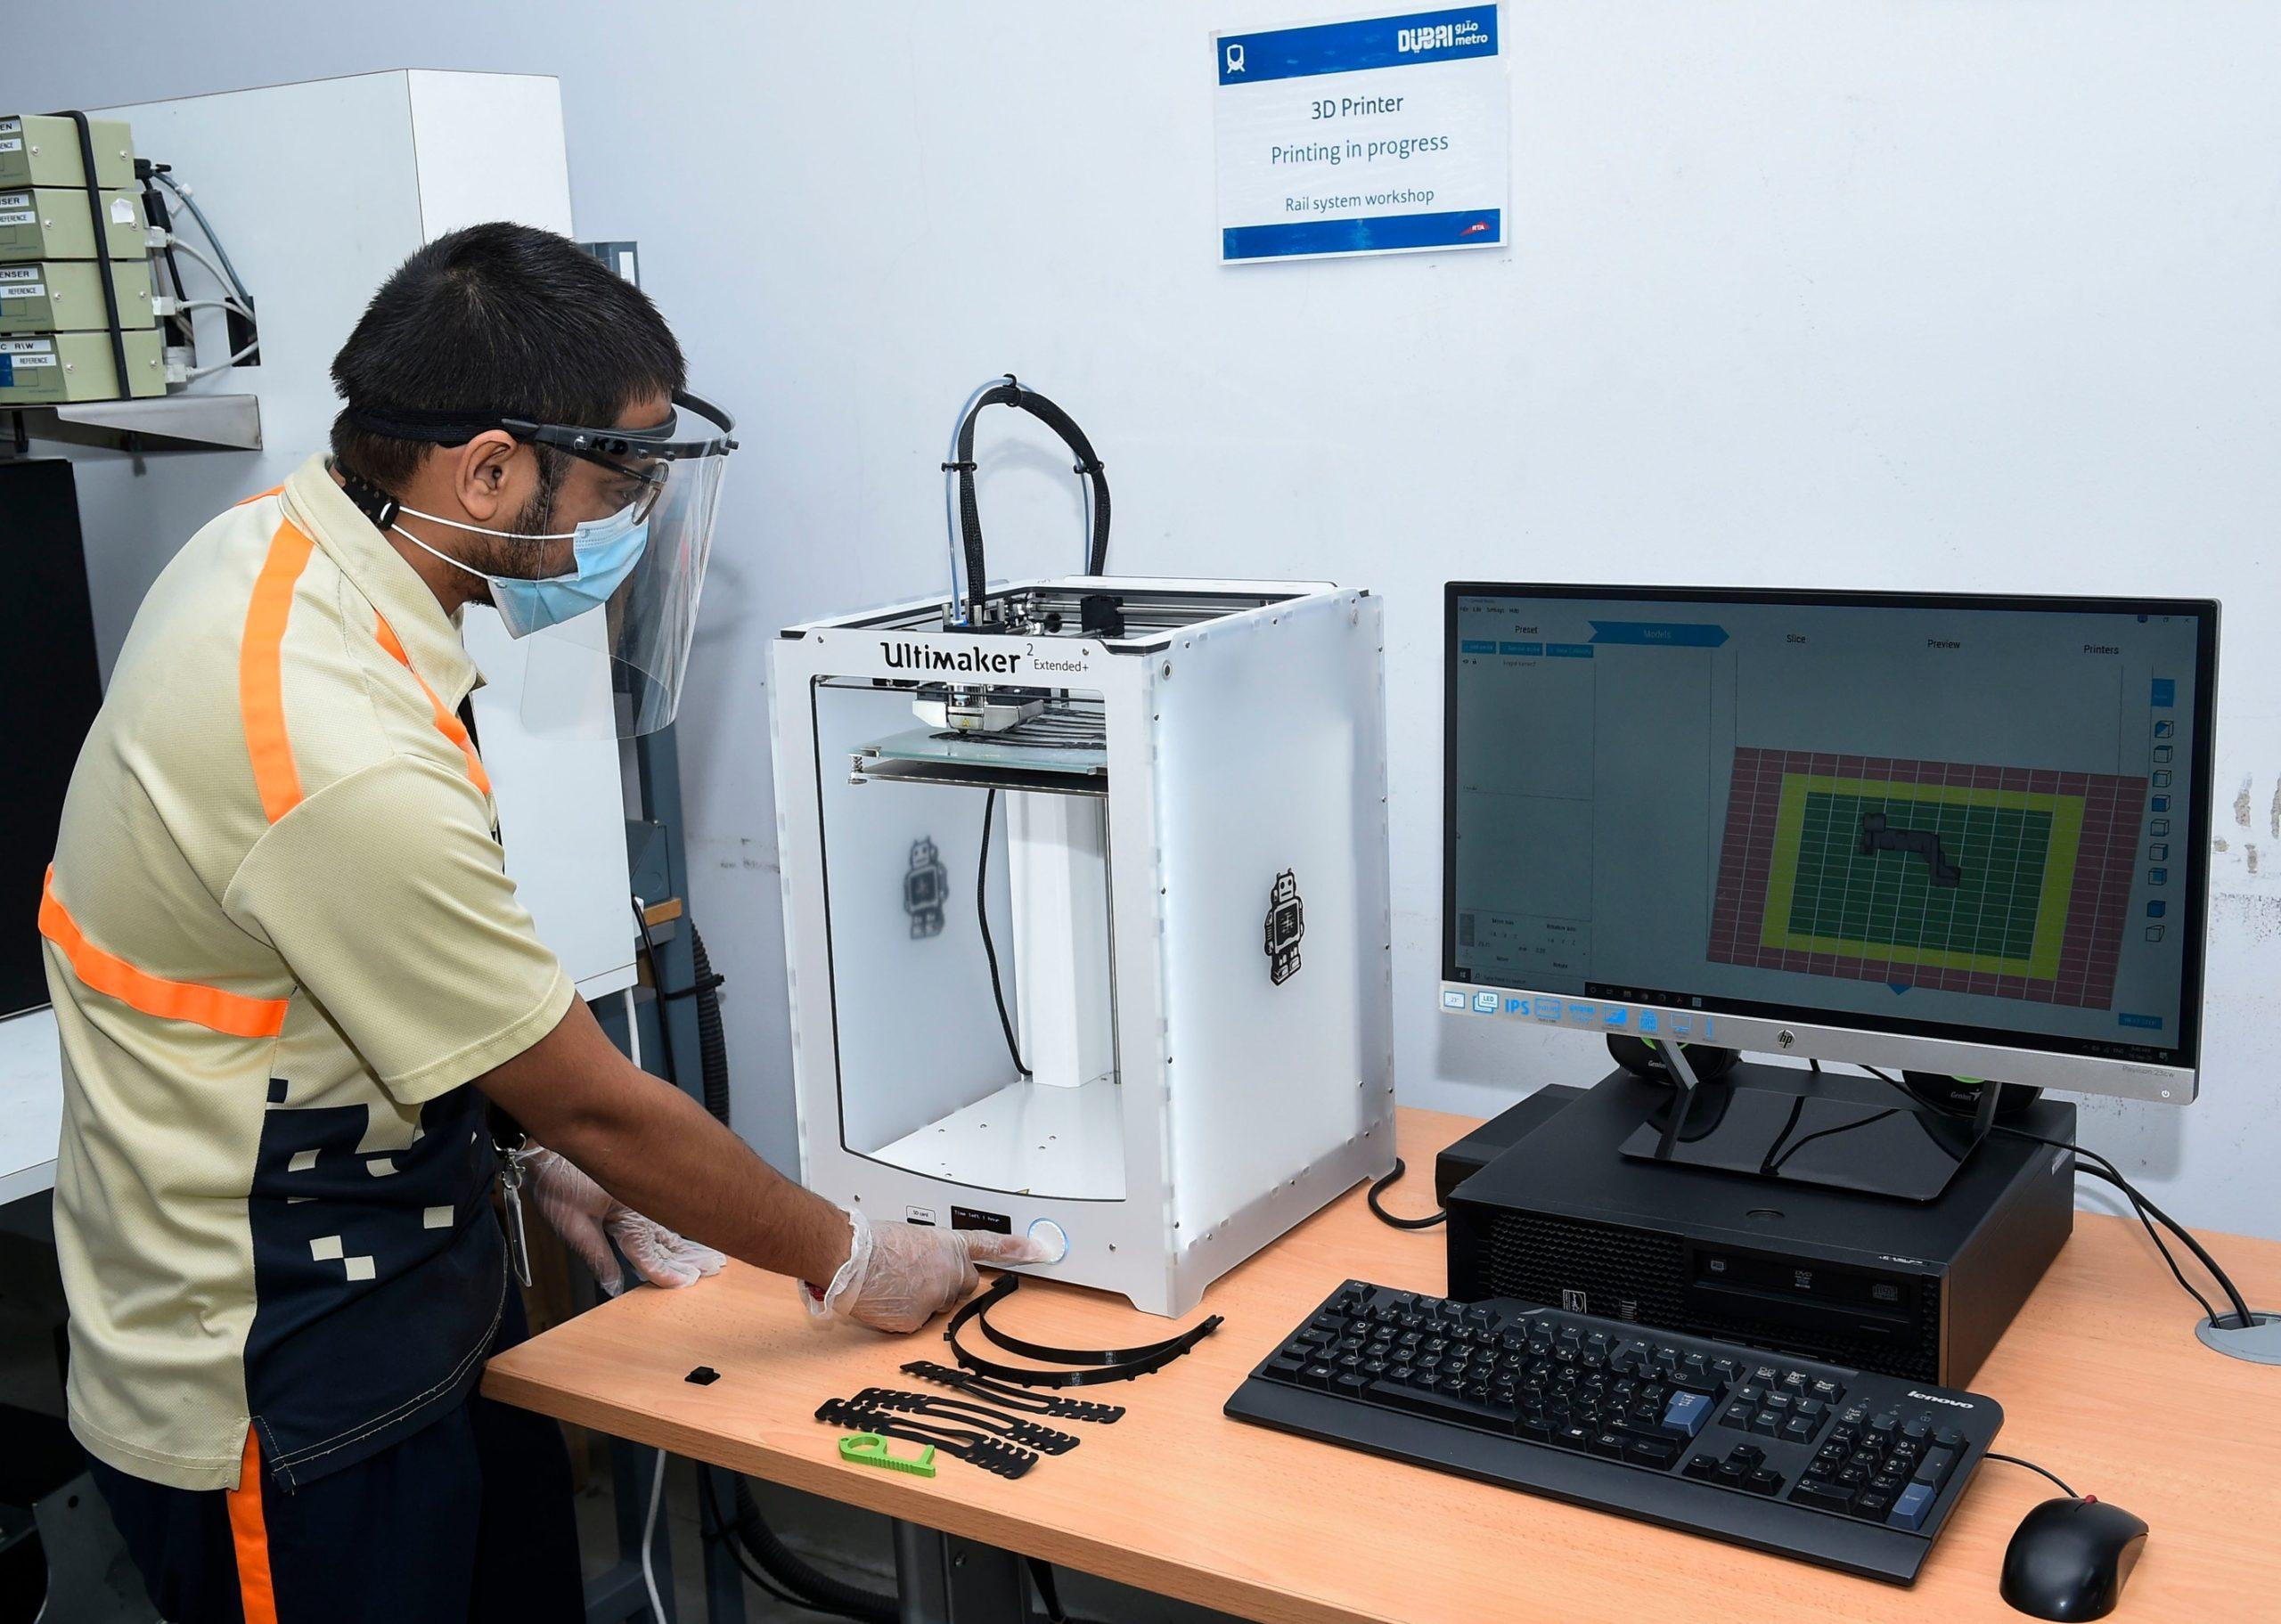 Dubai's RTA and Serco Build Metro Spare Parts Using 3D Printing Tech